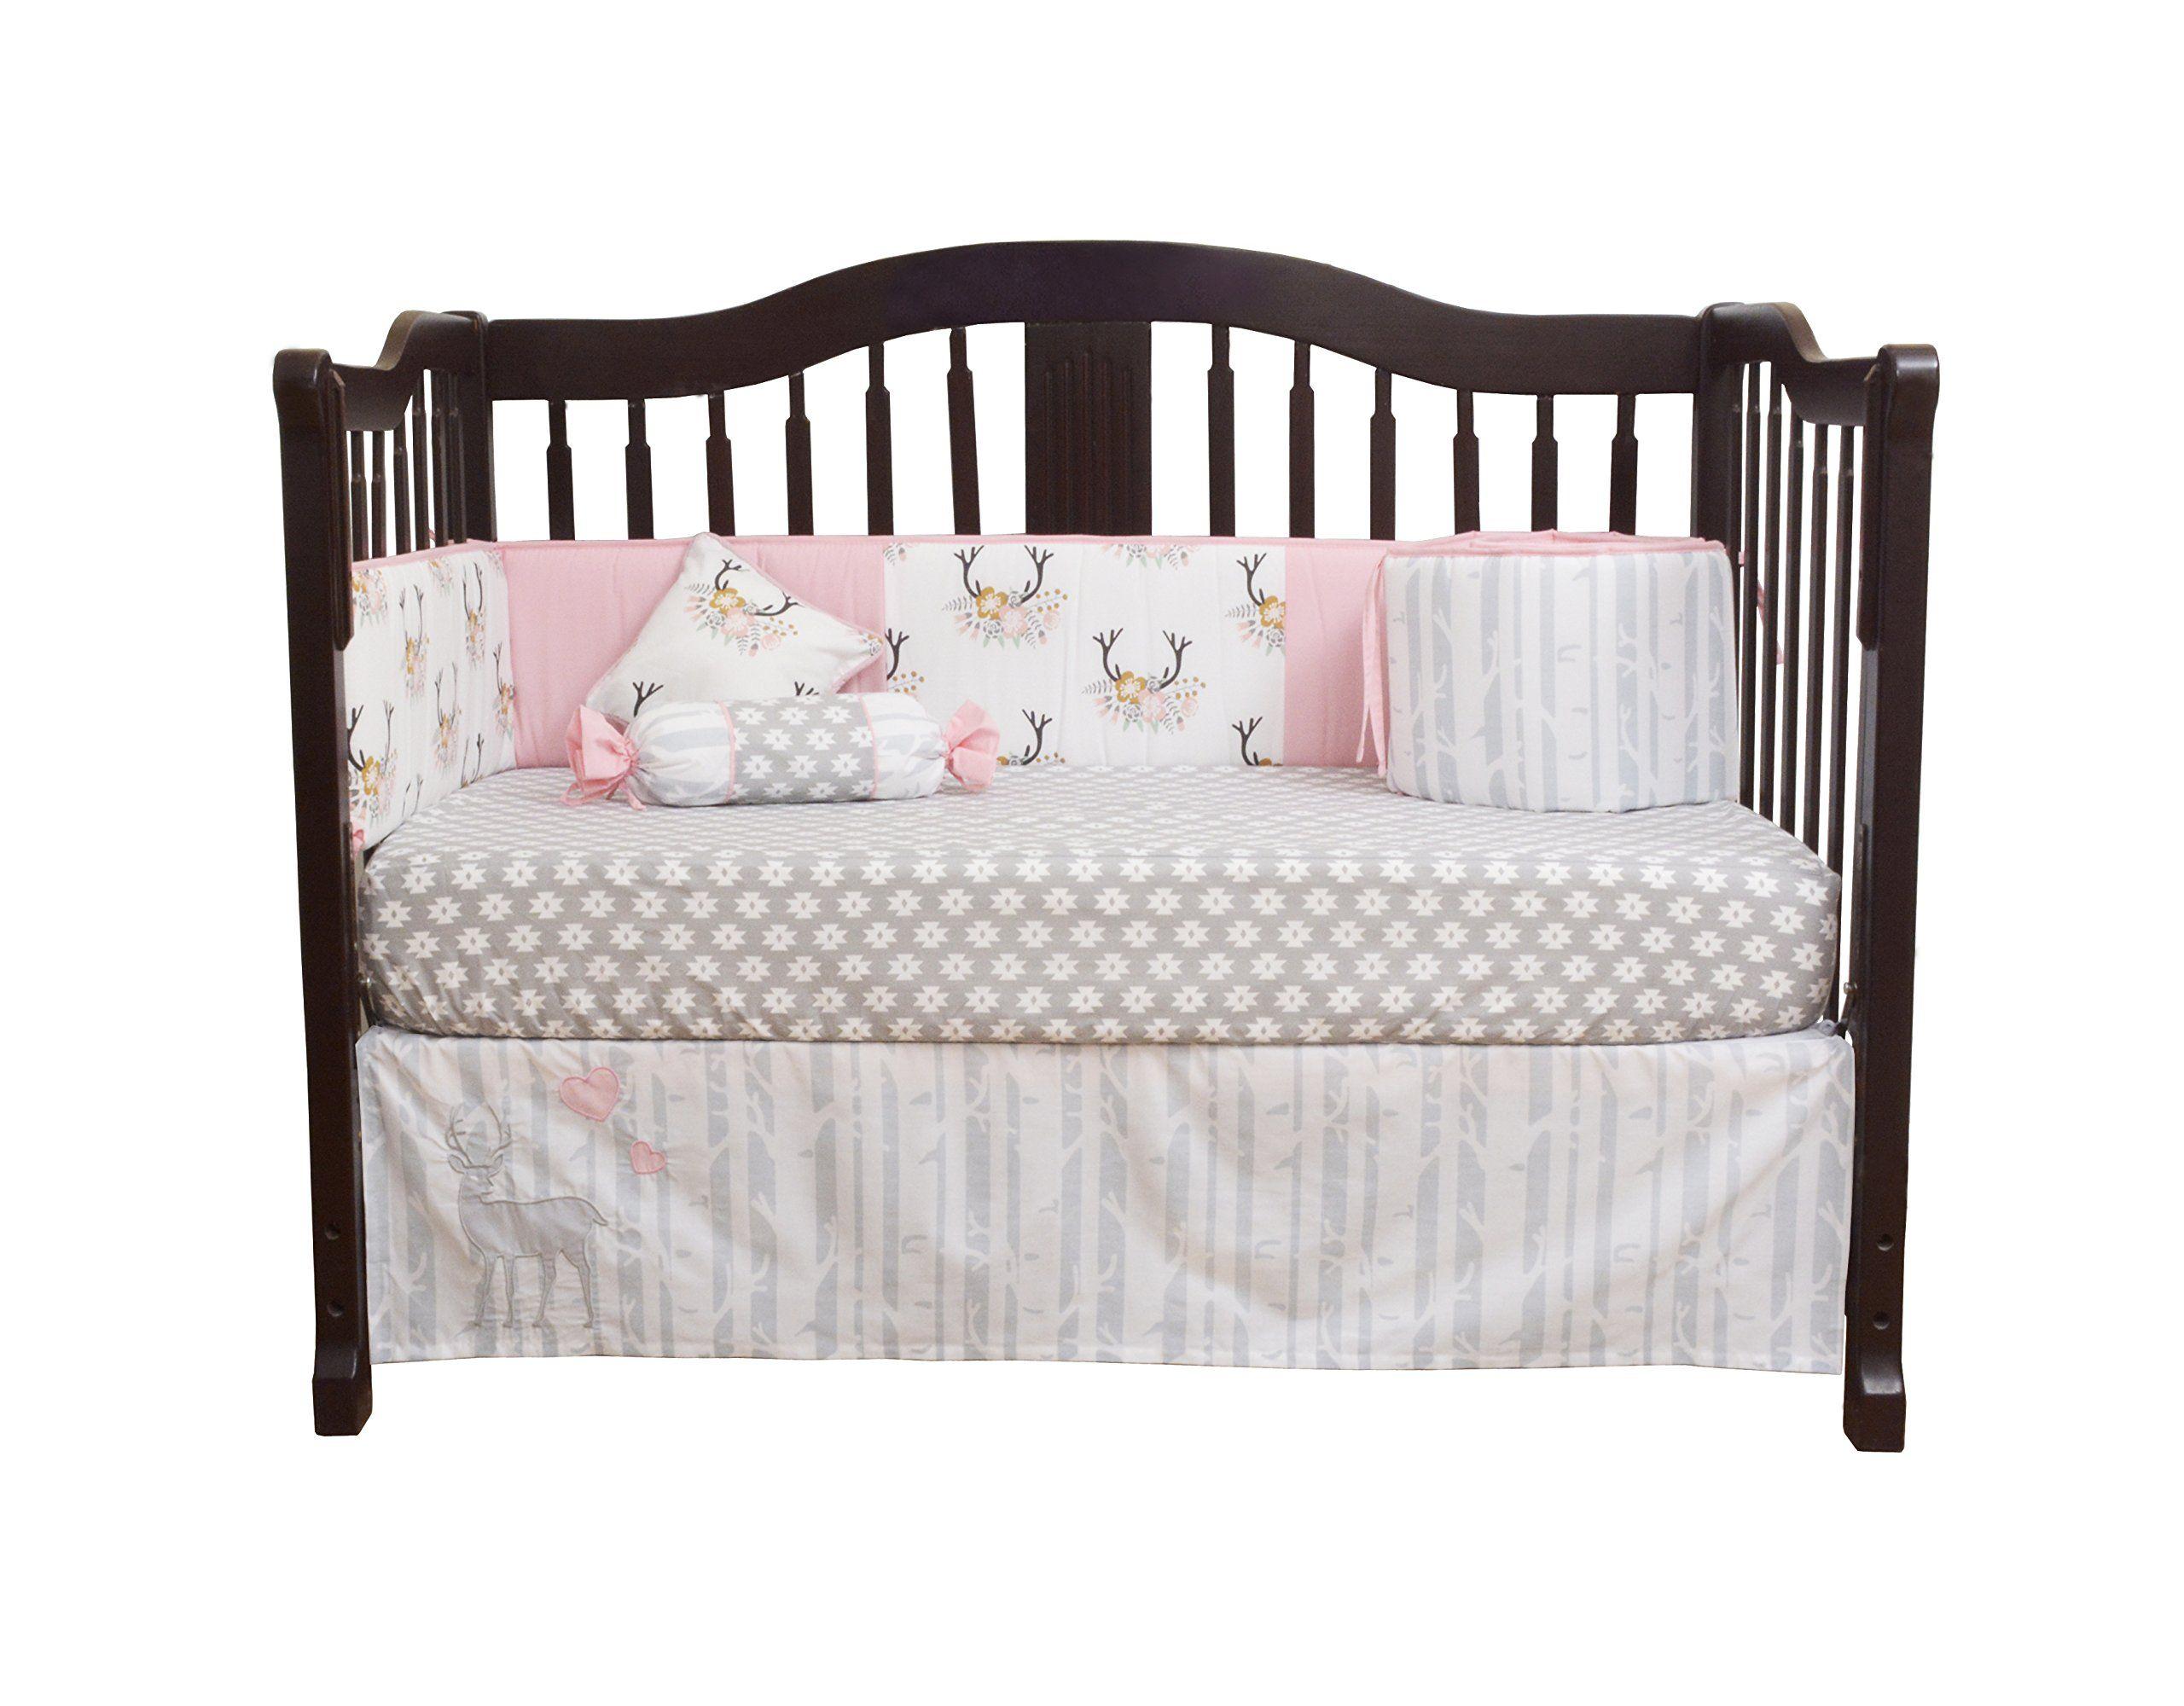 GEENNY Baby Girl Deer Family 13 Piece Nursery Crib Bedding